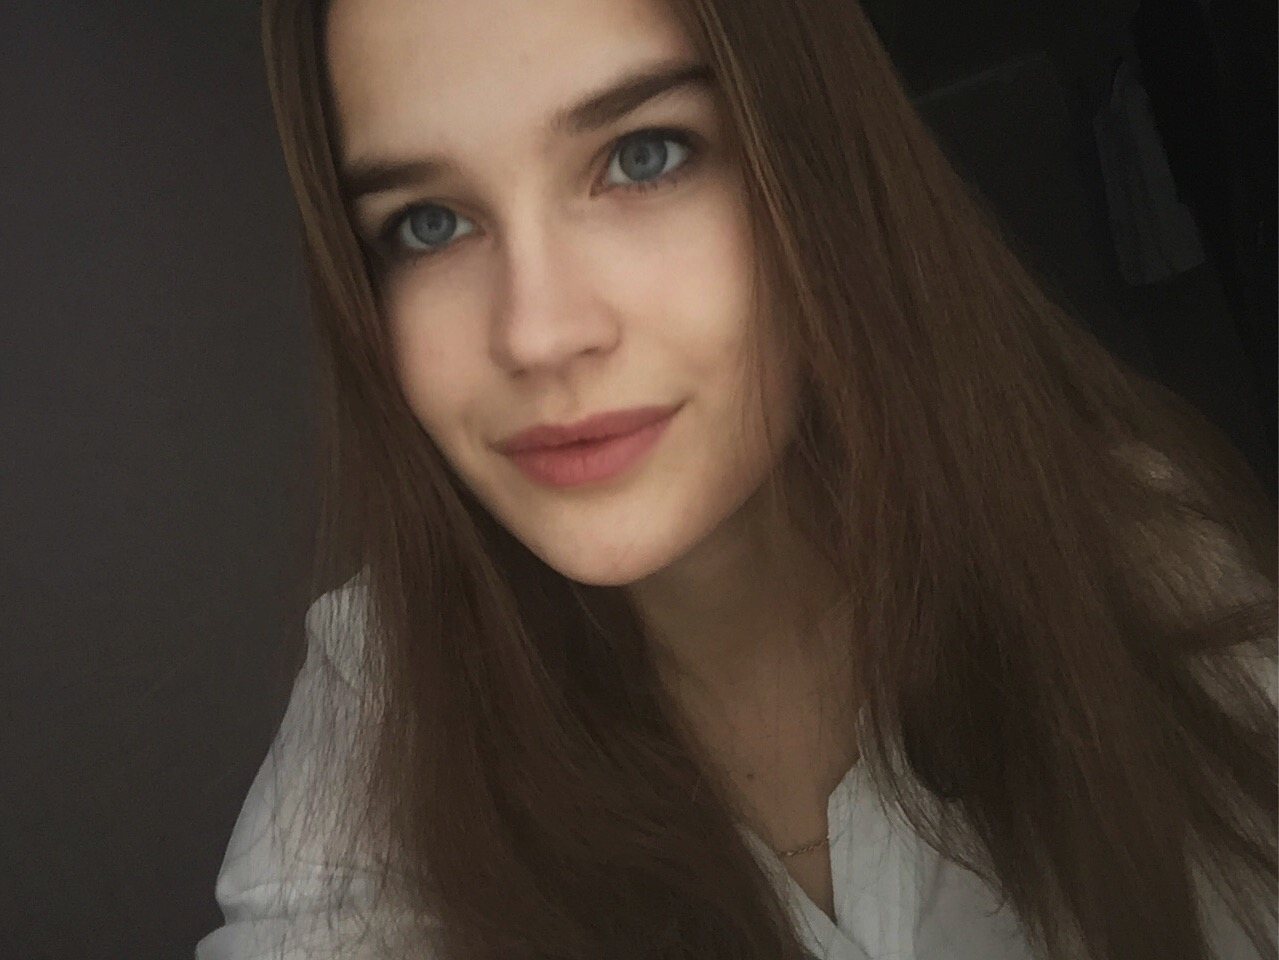 Карина зинченко фото 2